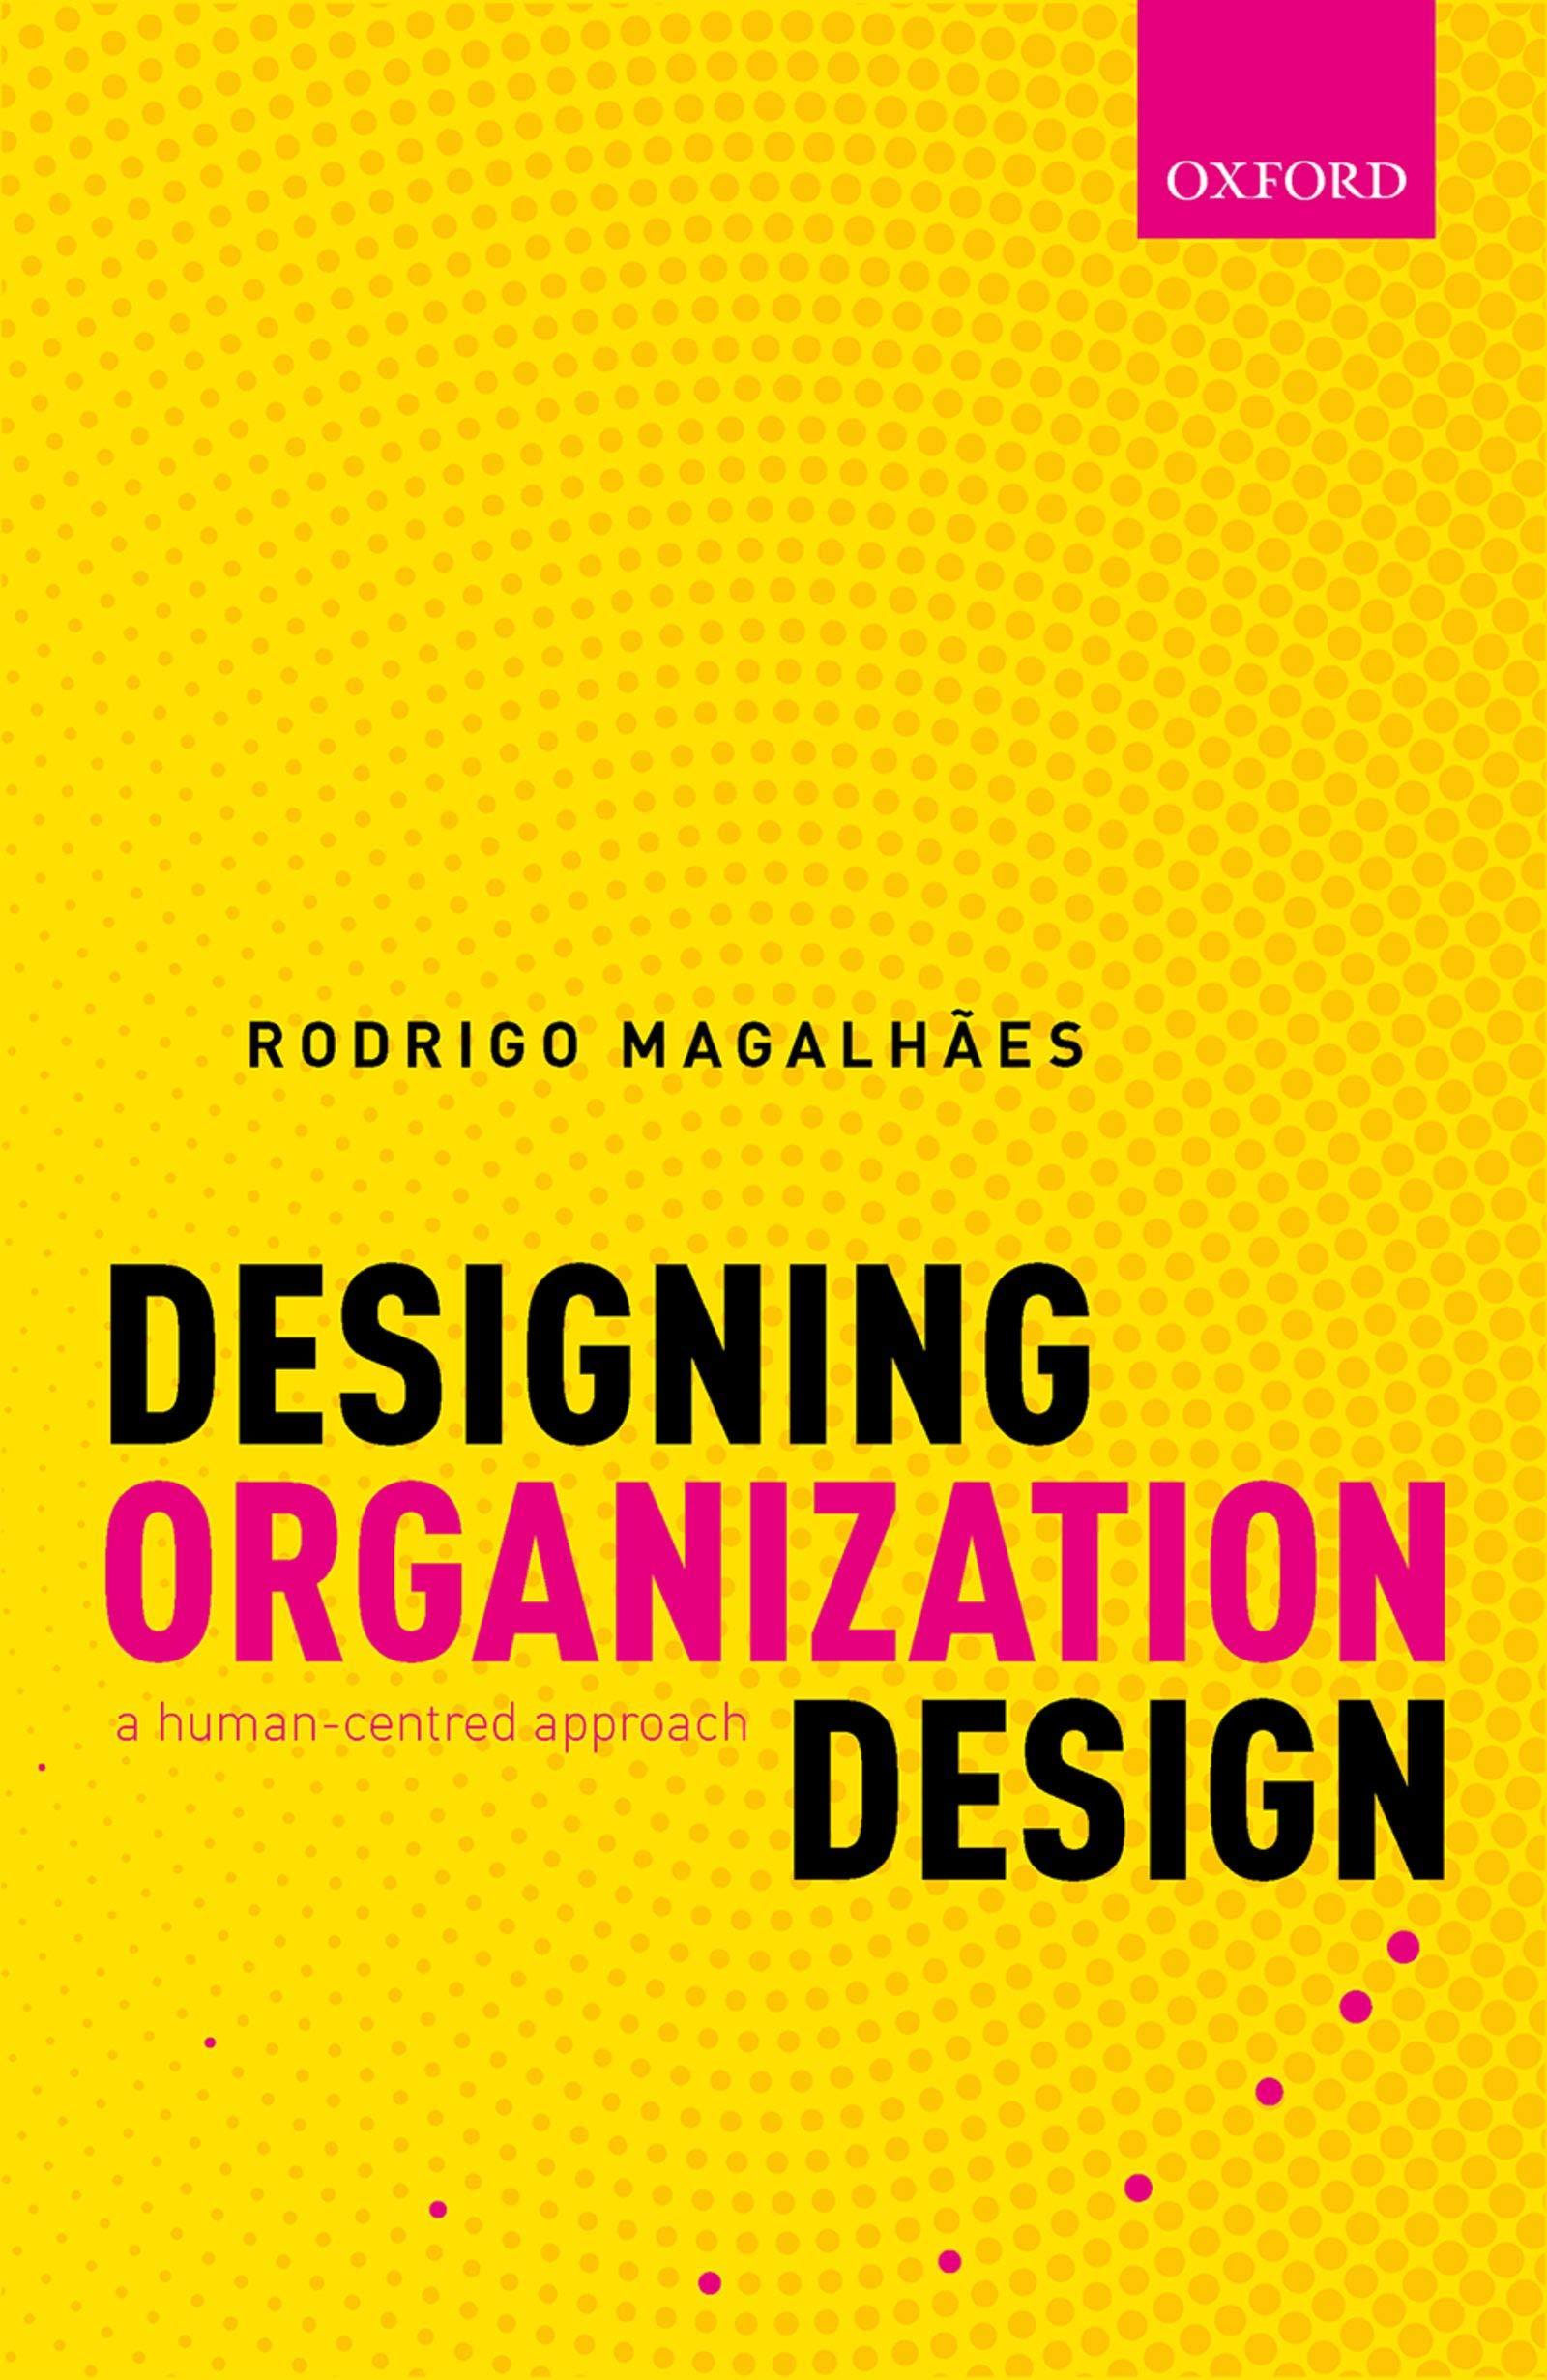 Designing Organization Design: A Human-Centred Approach